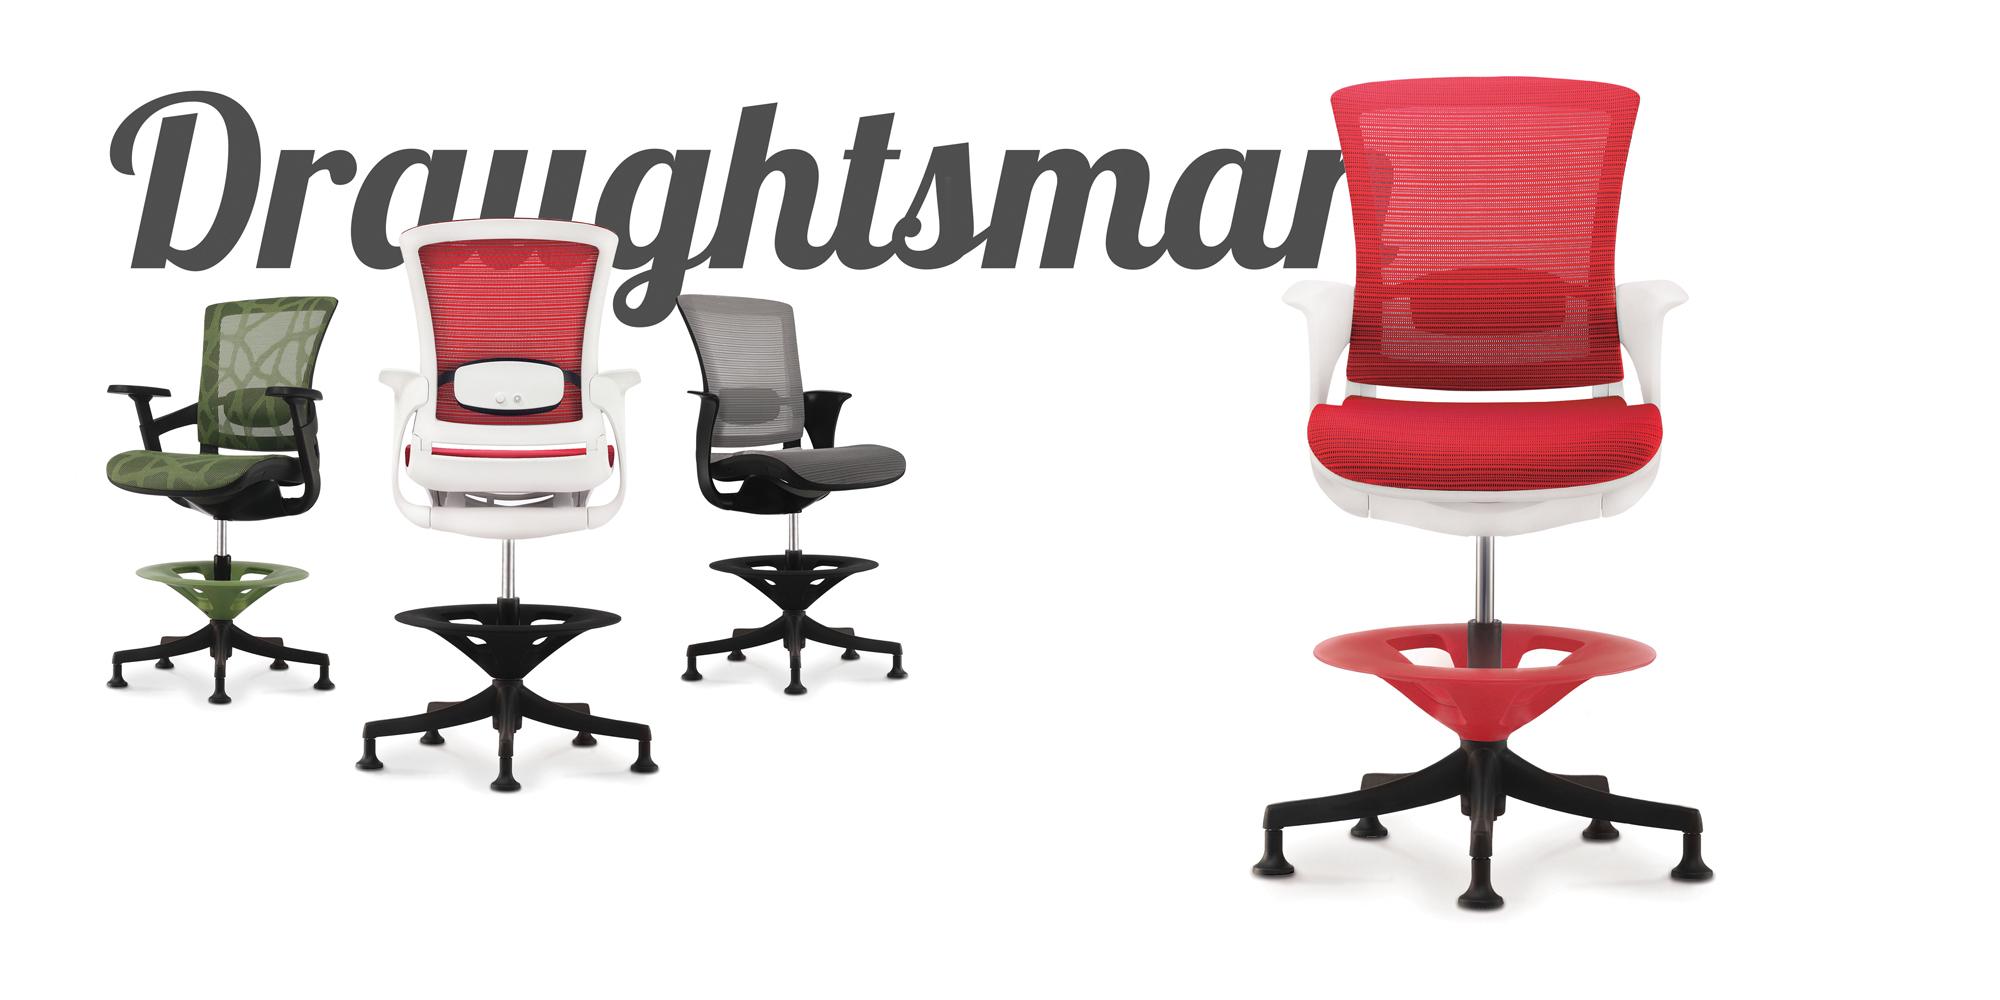 skate draughtsman s chair margolis furniture